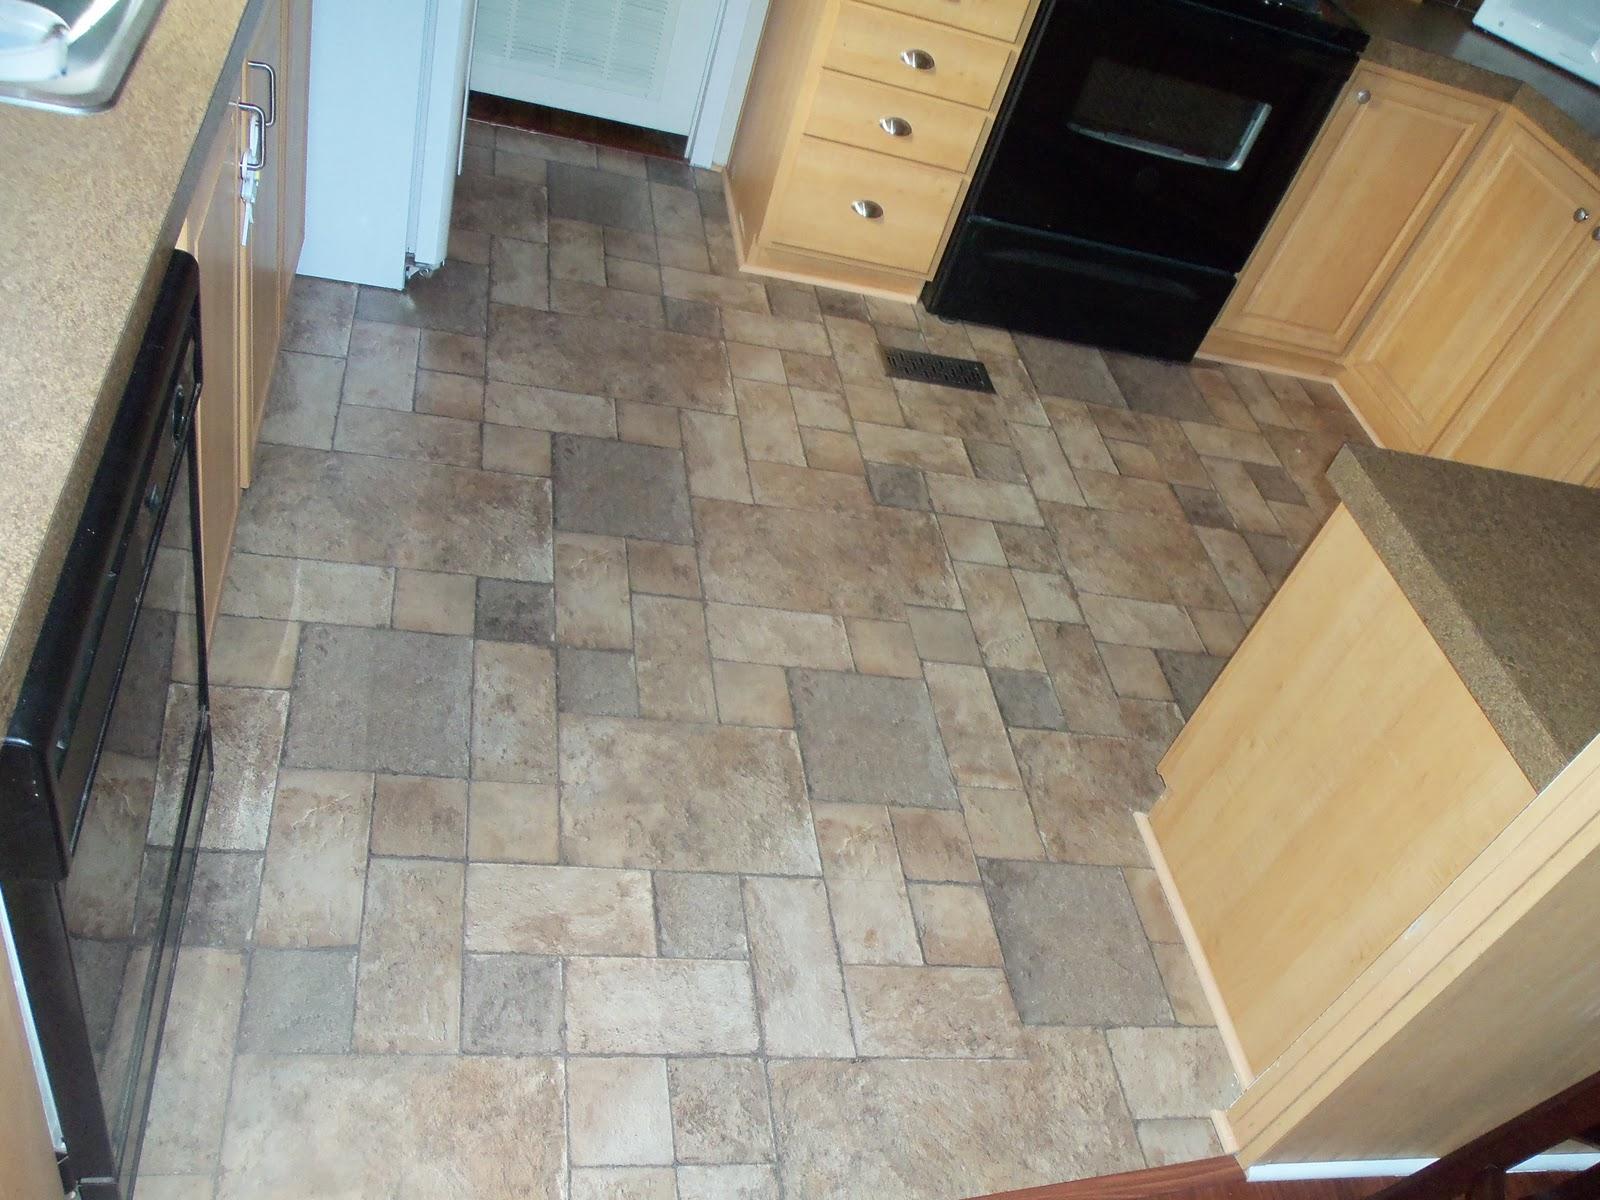 mobile home flooring. Mobile Home Flooring